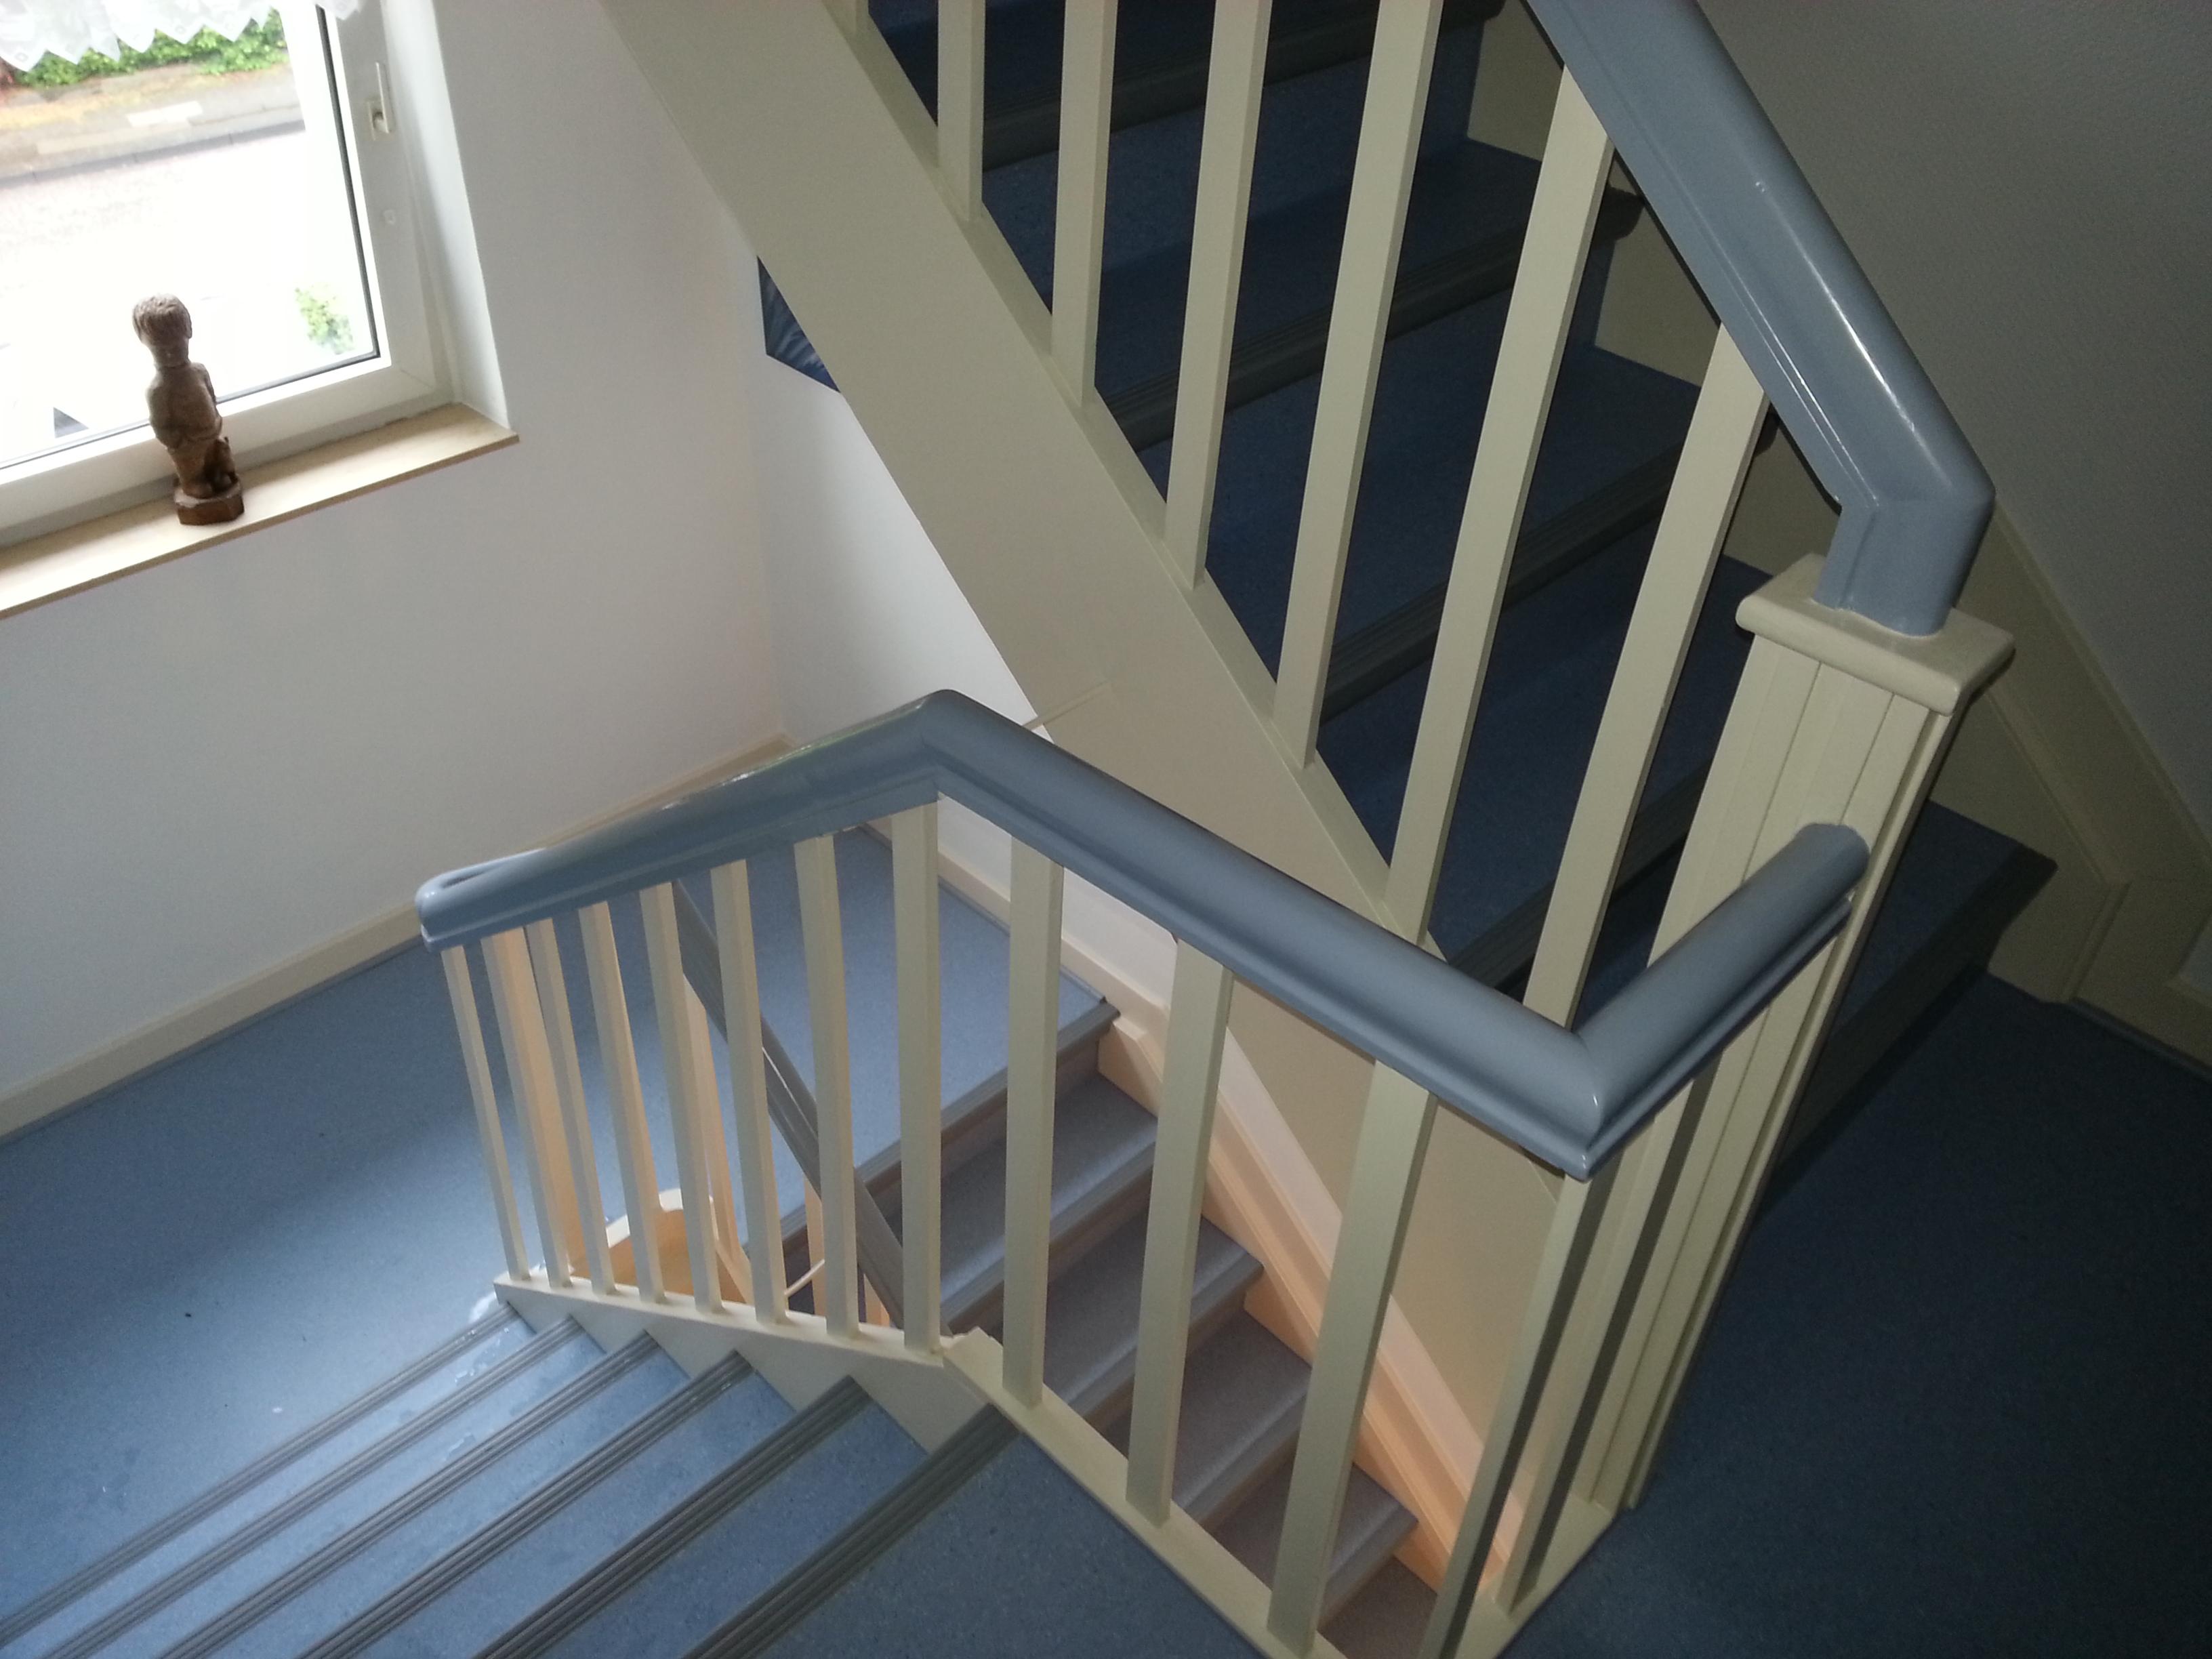 Treppenhaus mit PVC-Bodenbelag